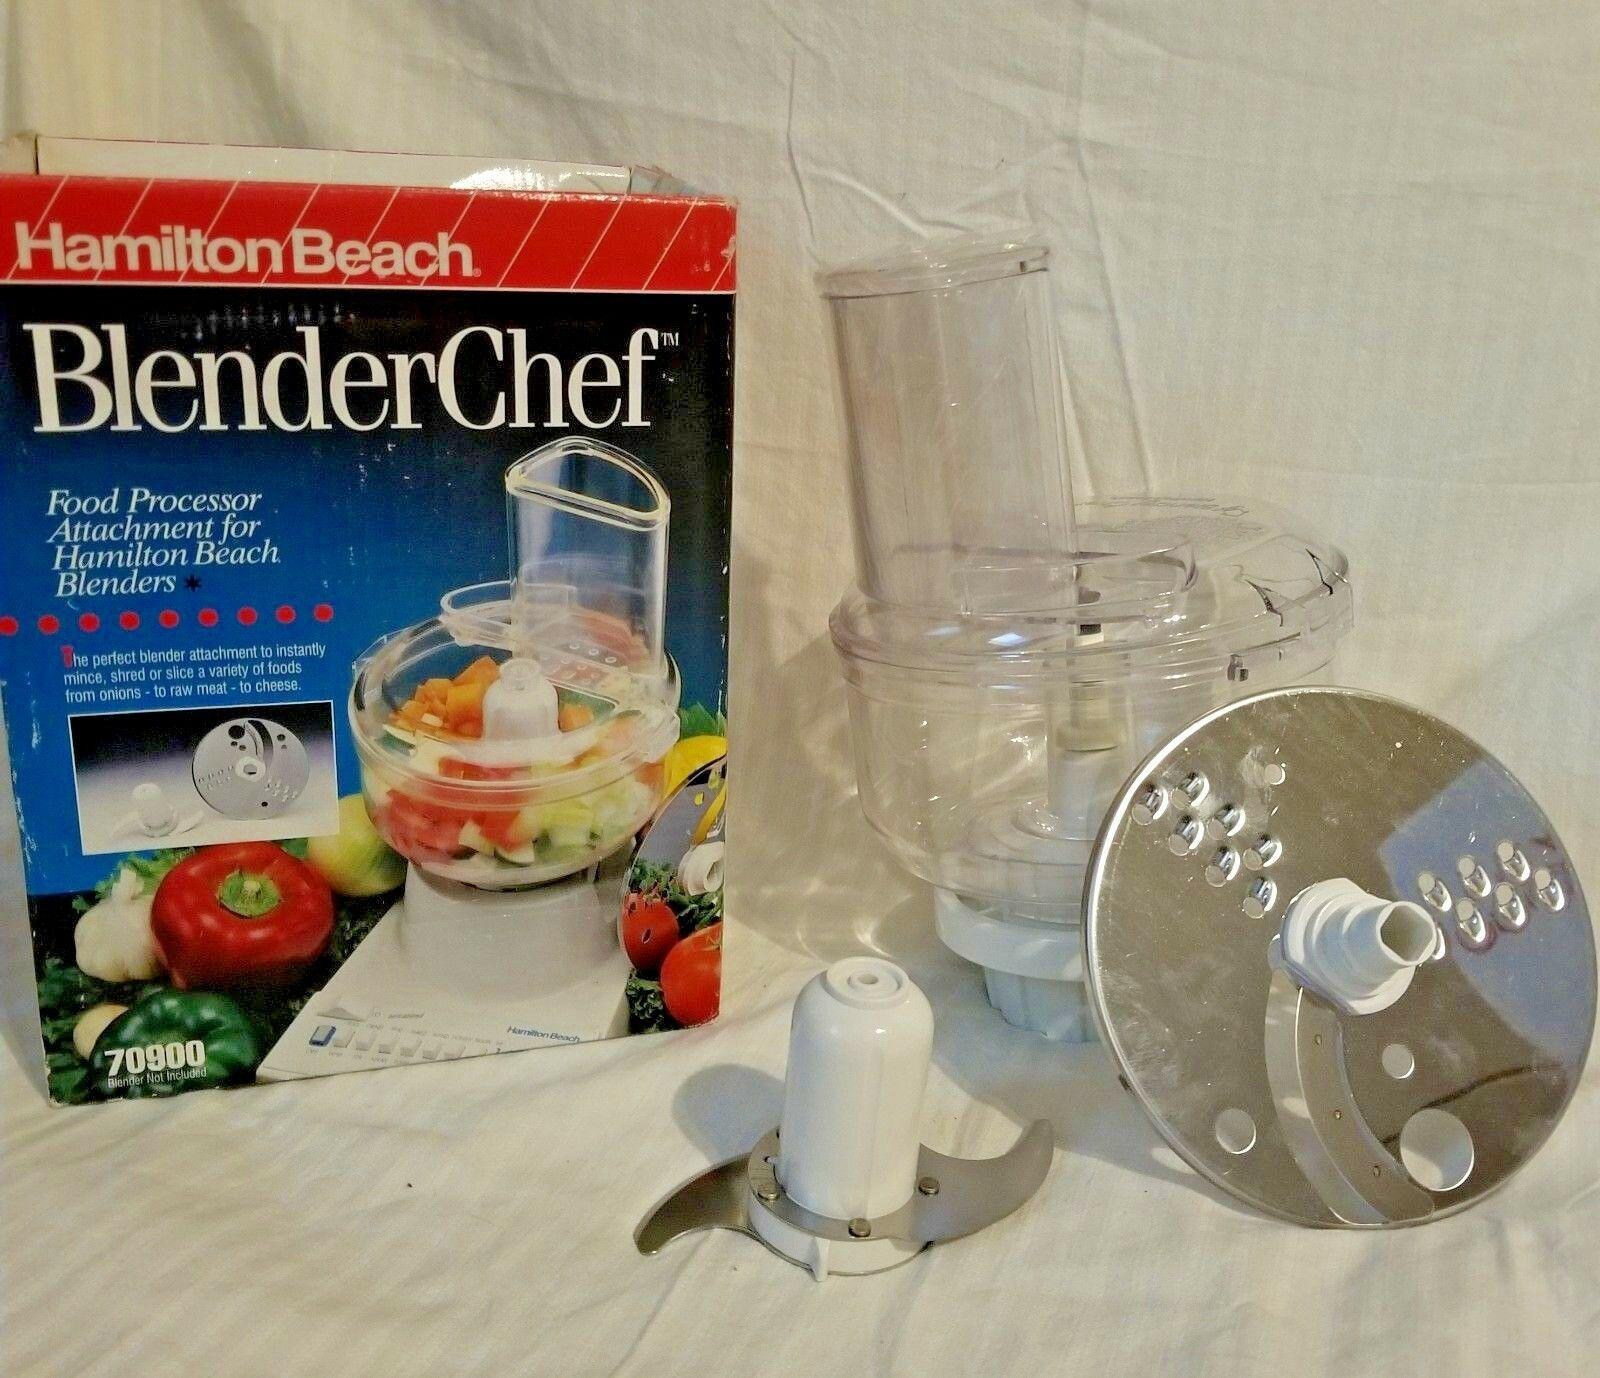 Hamilton Beach  blender Chef Food Processor Chopper Mixer Attachment 70900 image 2